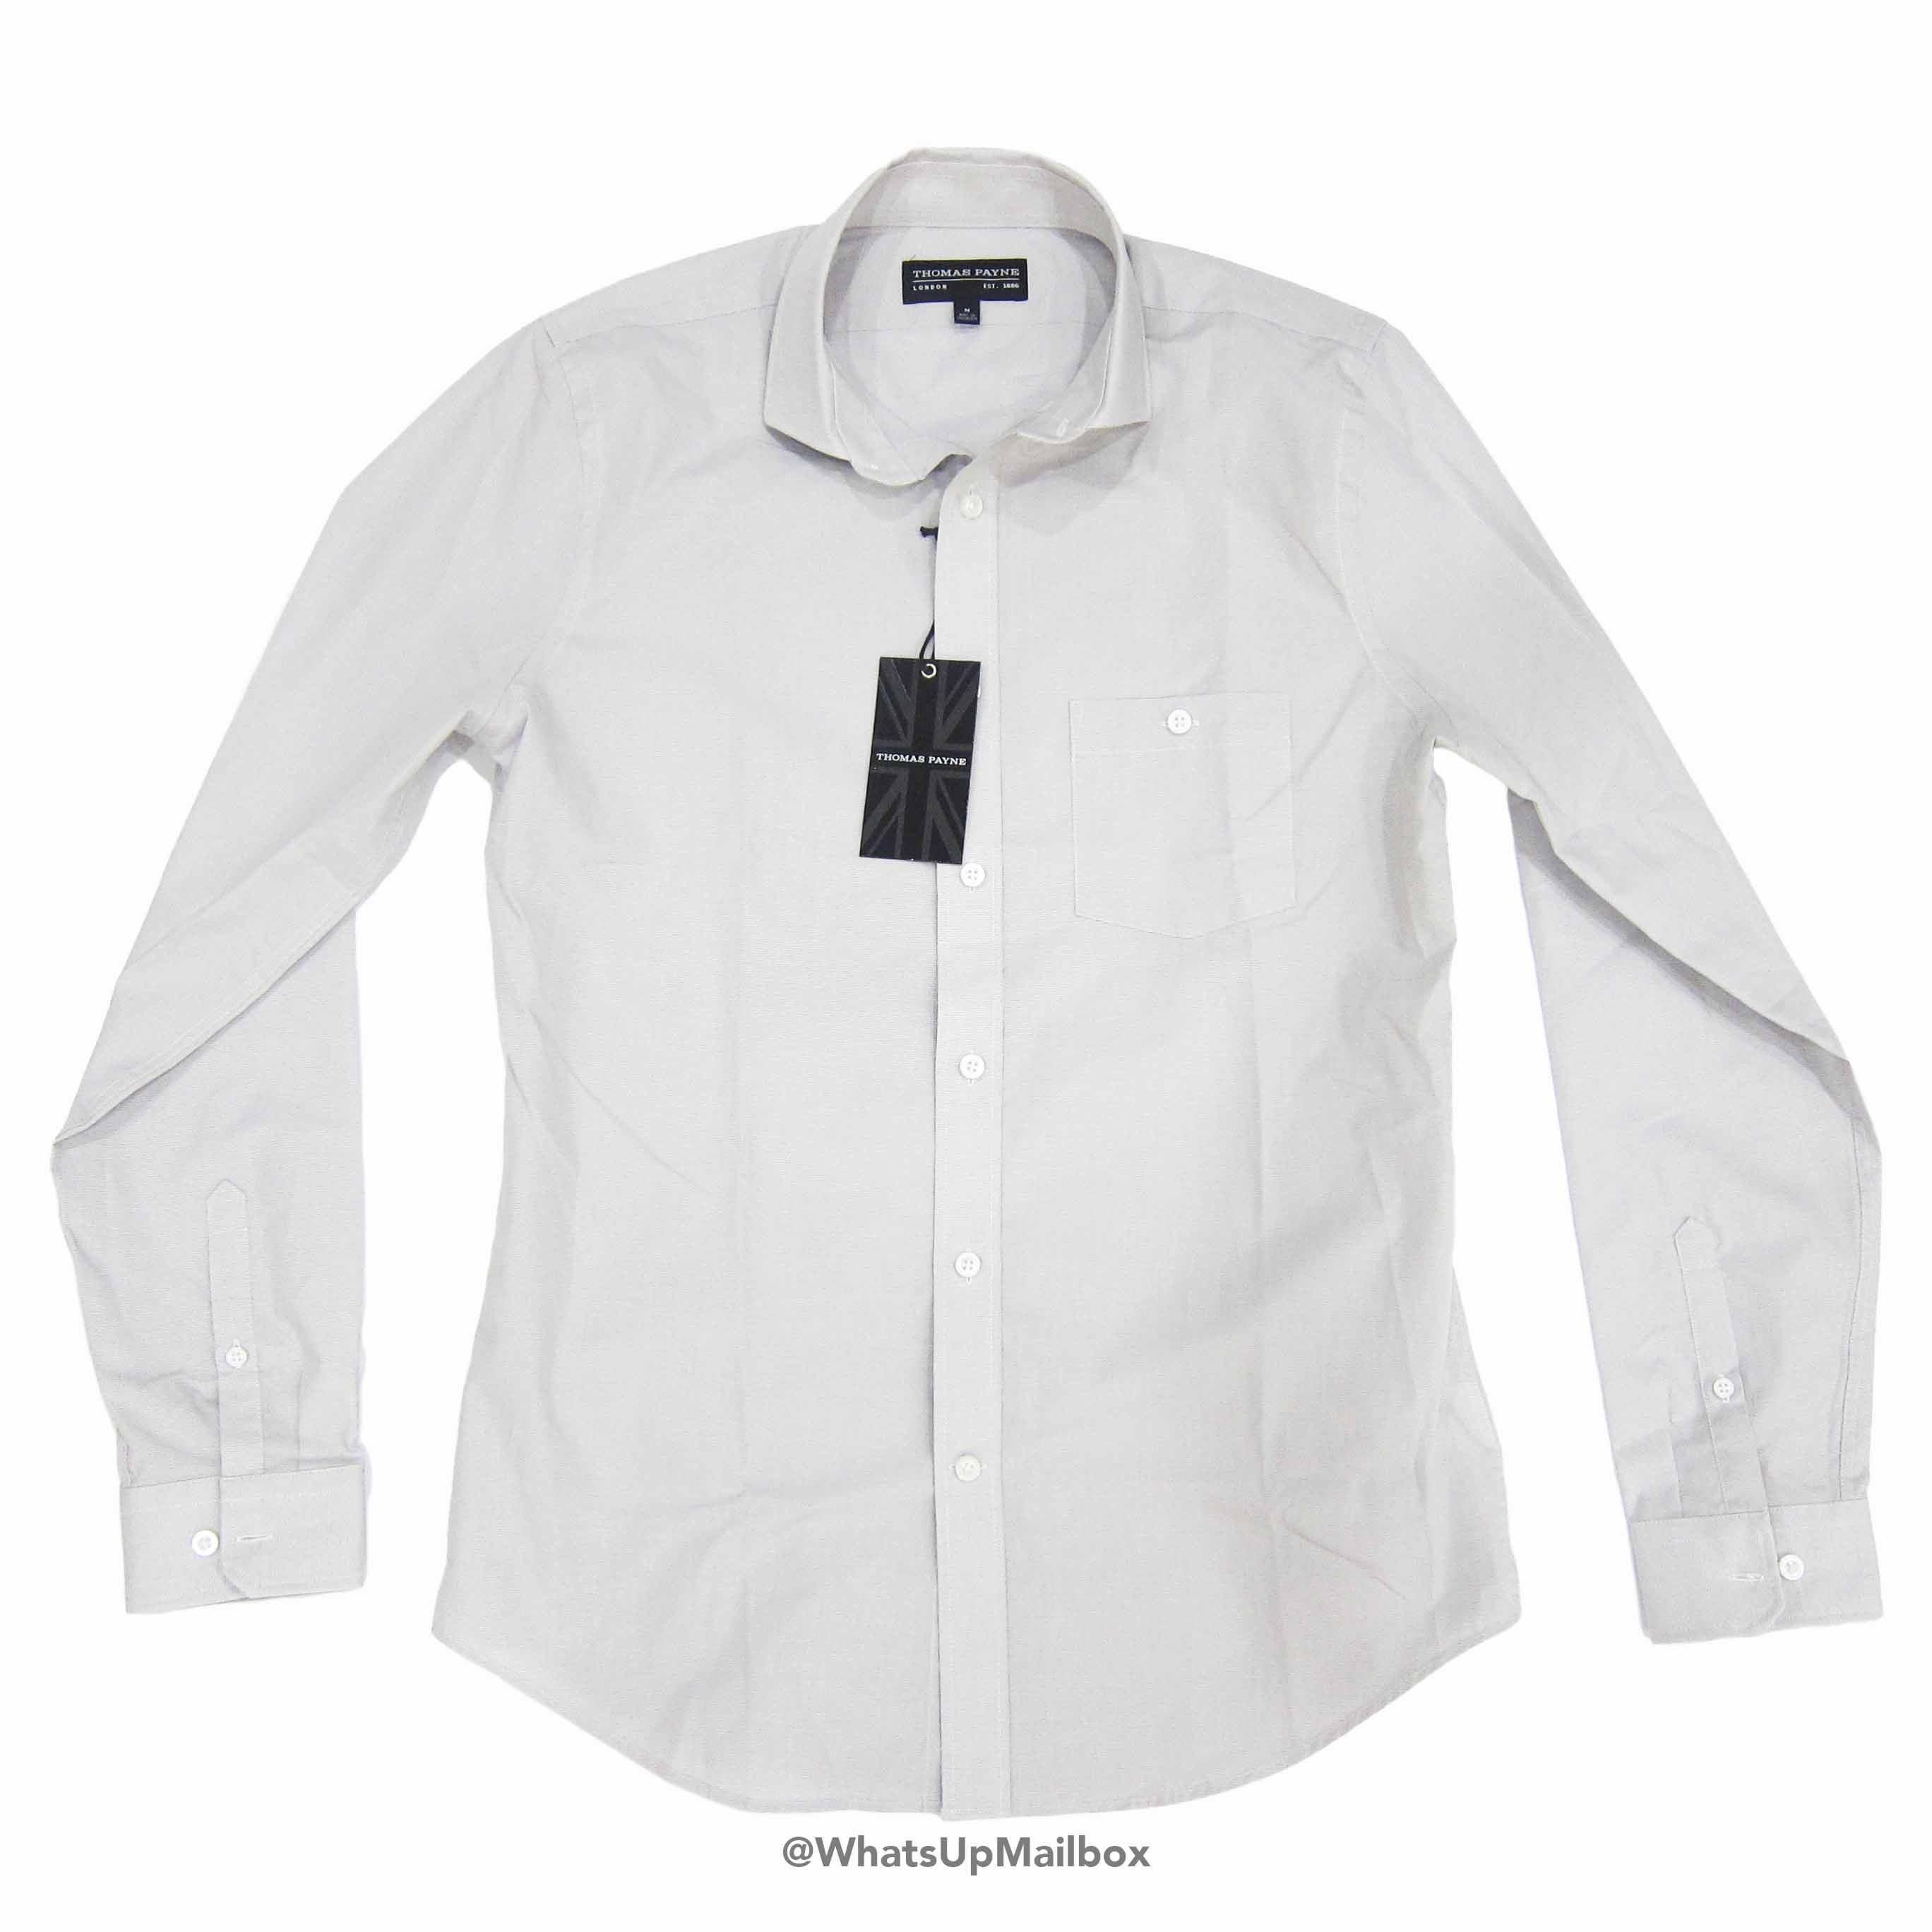 Thomas Payne - Rossmore Grey Pincheck Long Sleeve Shirt